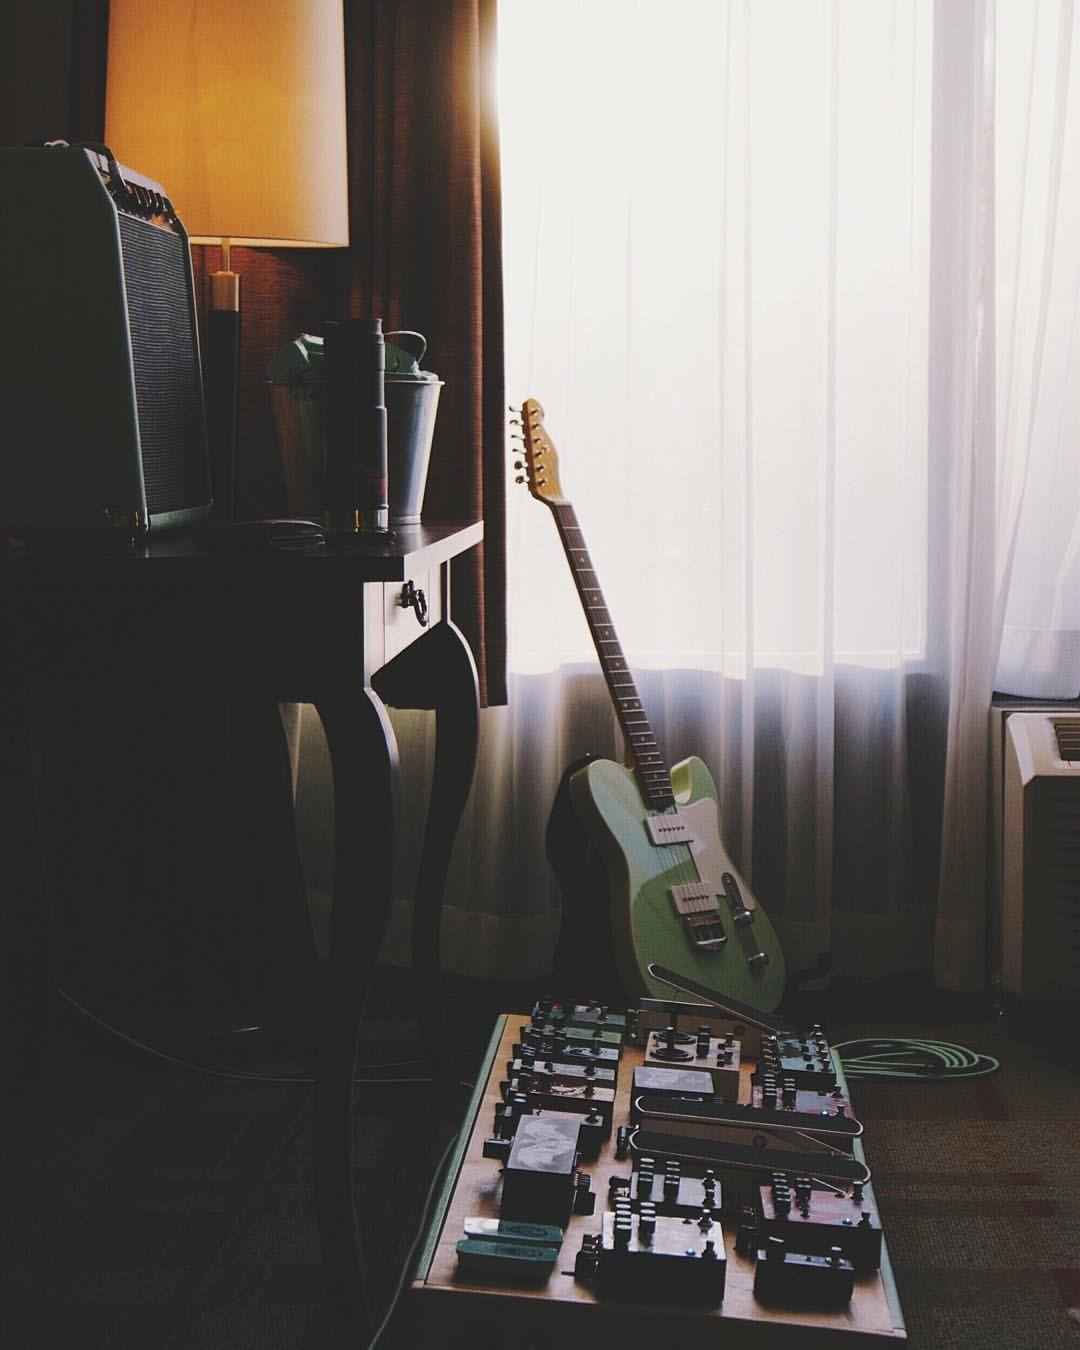 Fk yeah effects pedals travisswarren guitars and